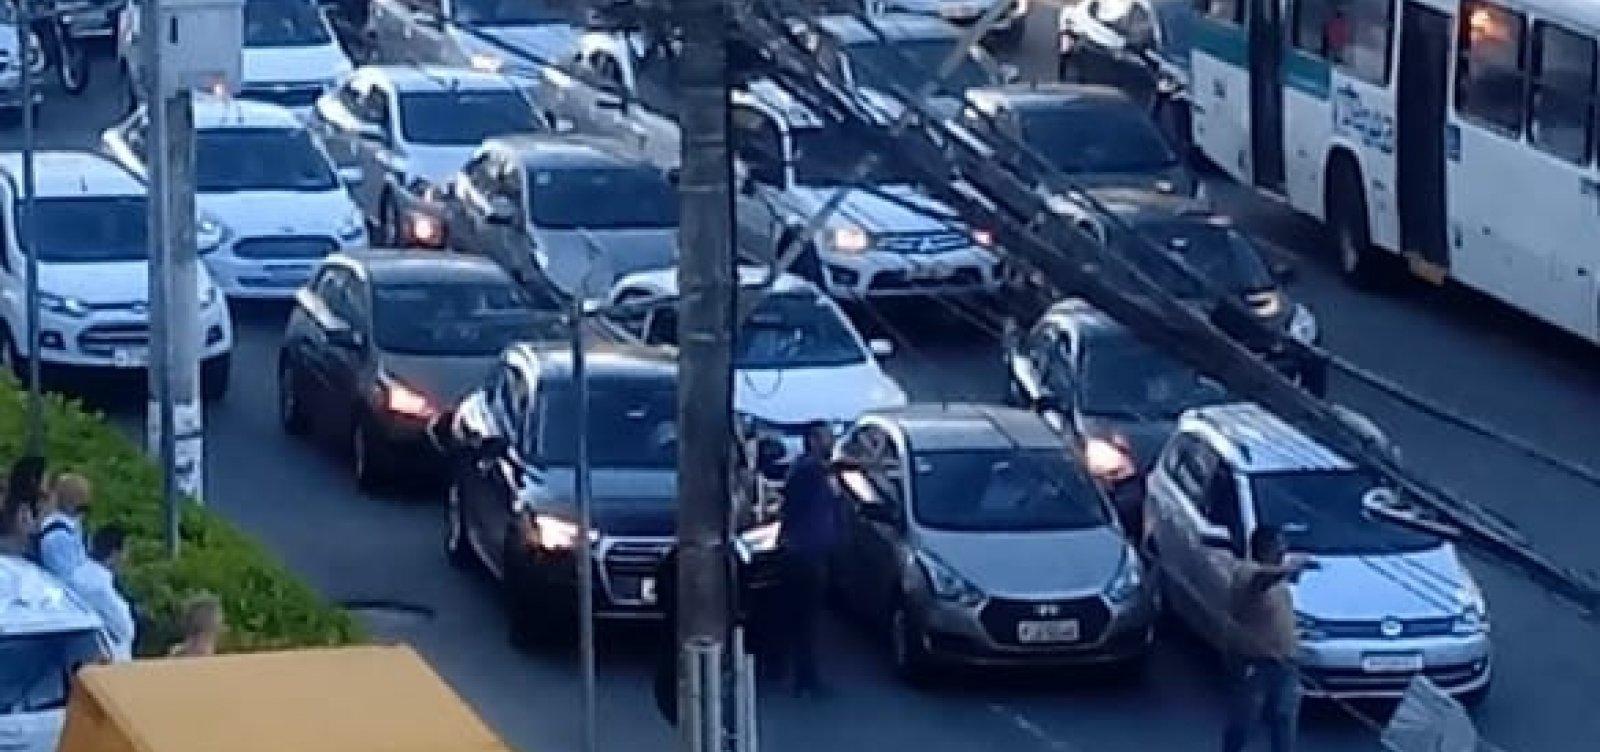 [Carreata de motoristas do Uber fecha Avenida Tancredo Neves]